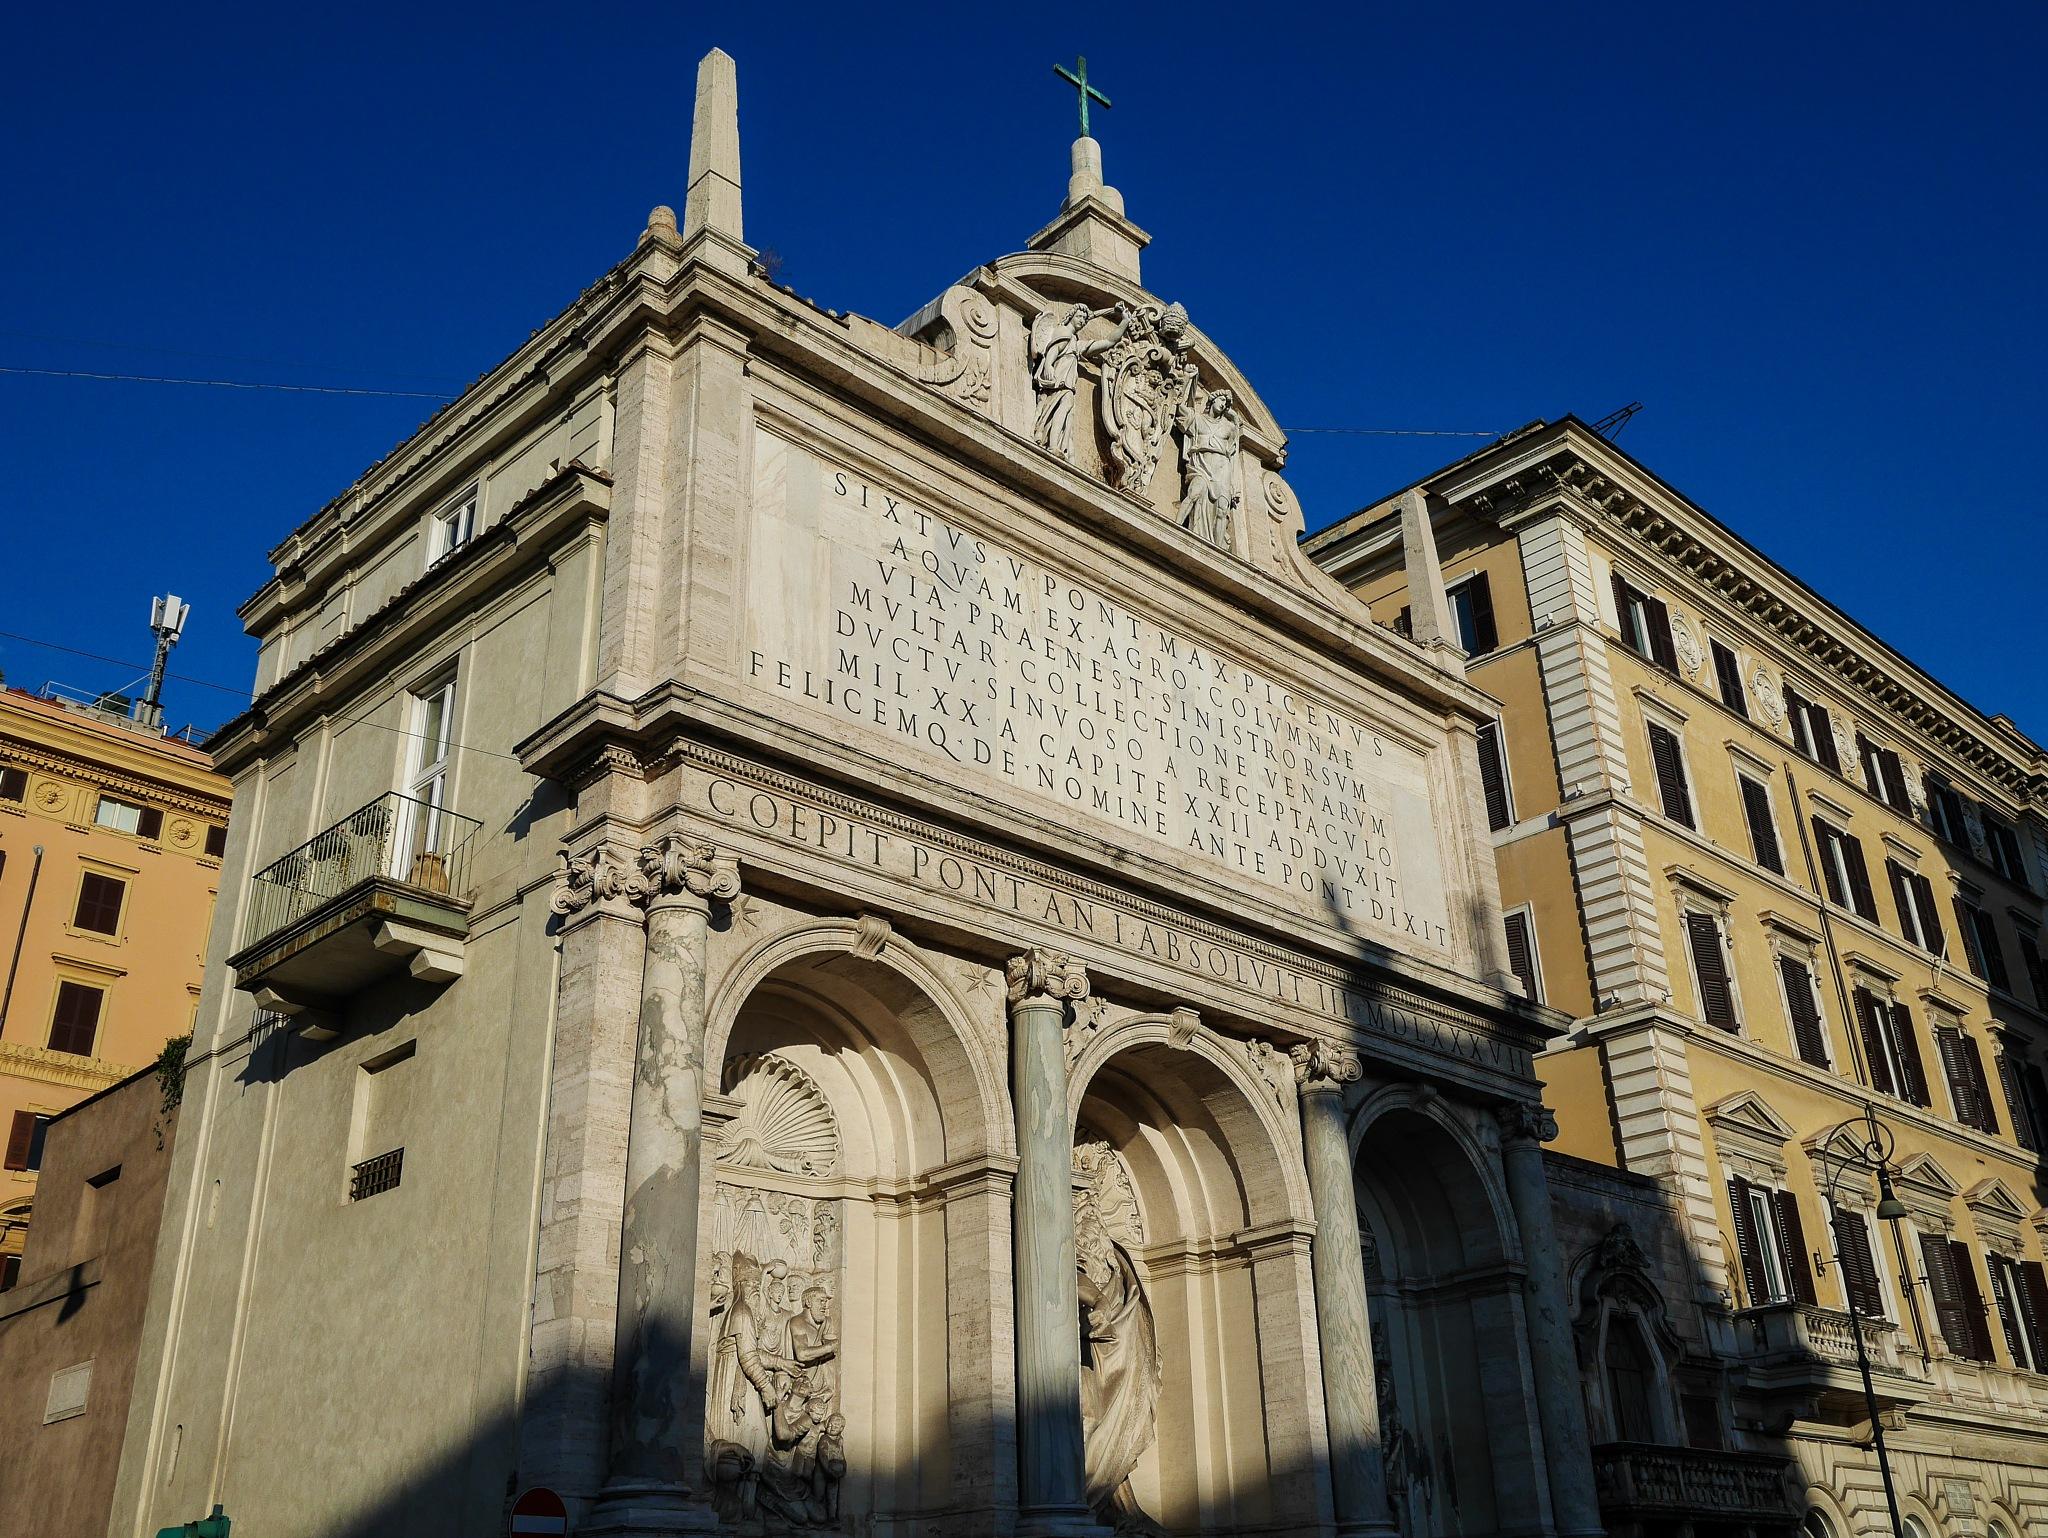 When in Rome by Gail Atangan